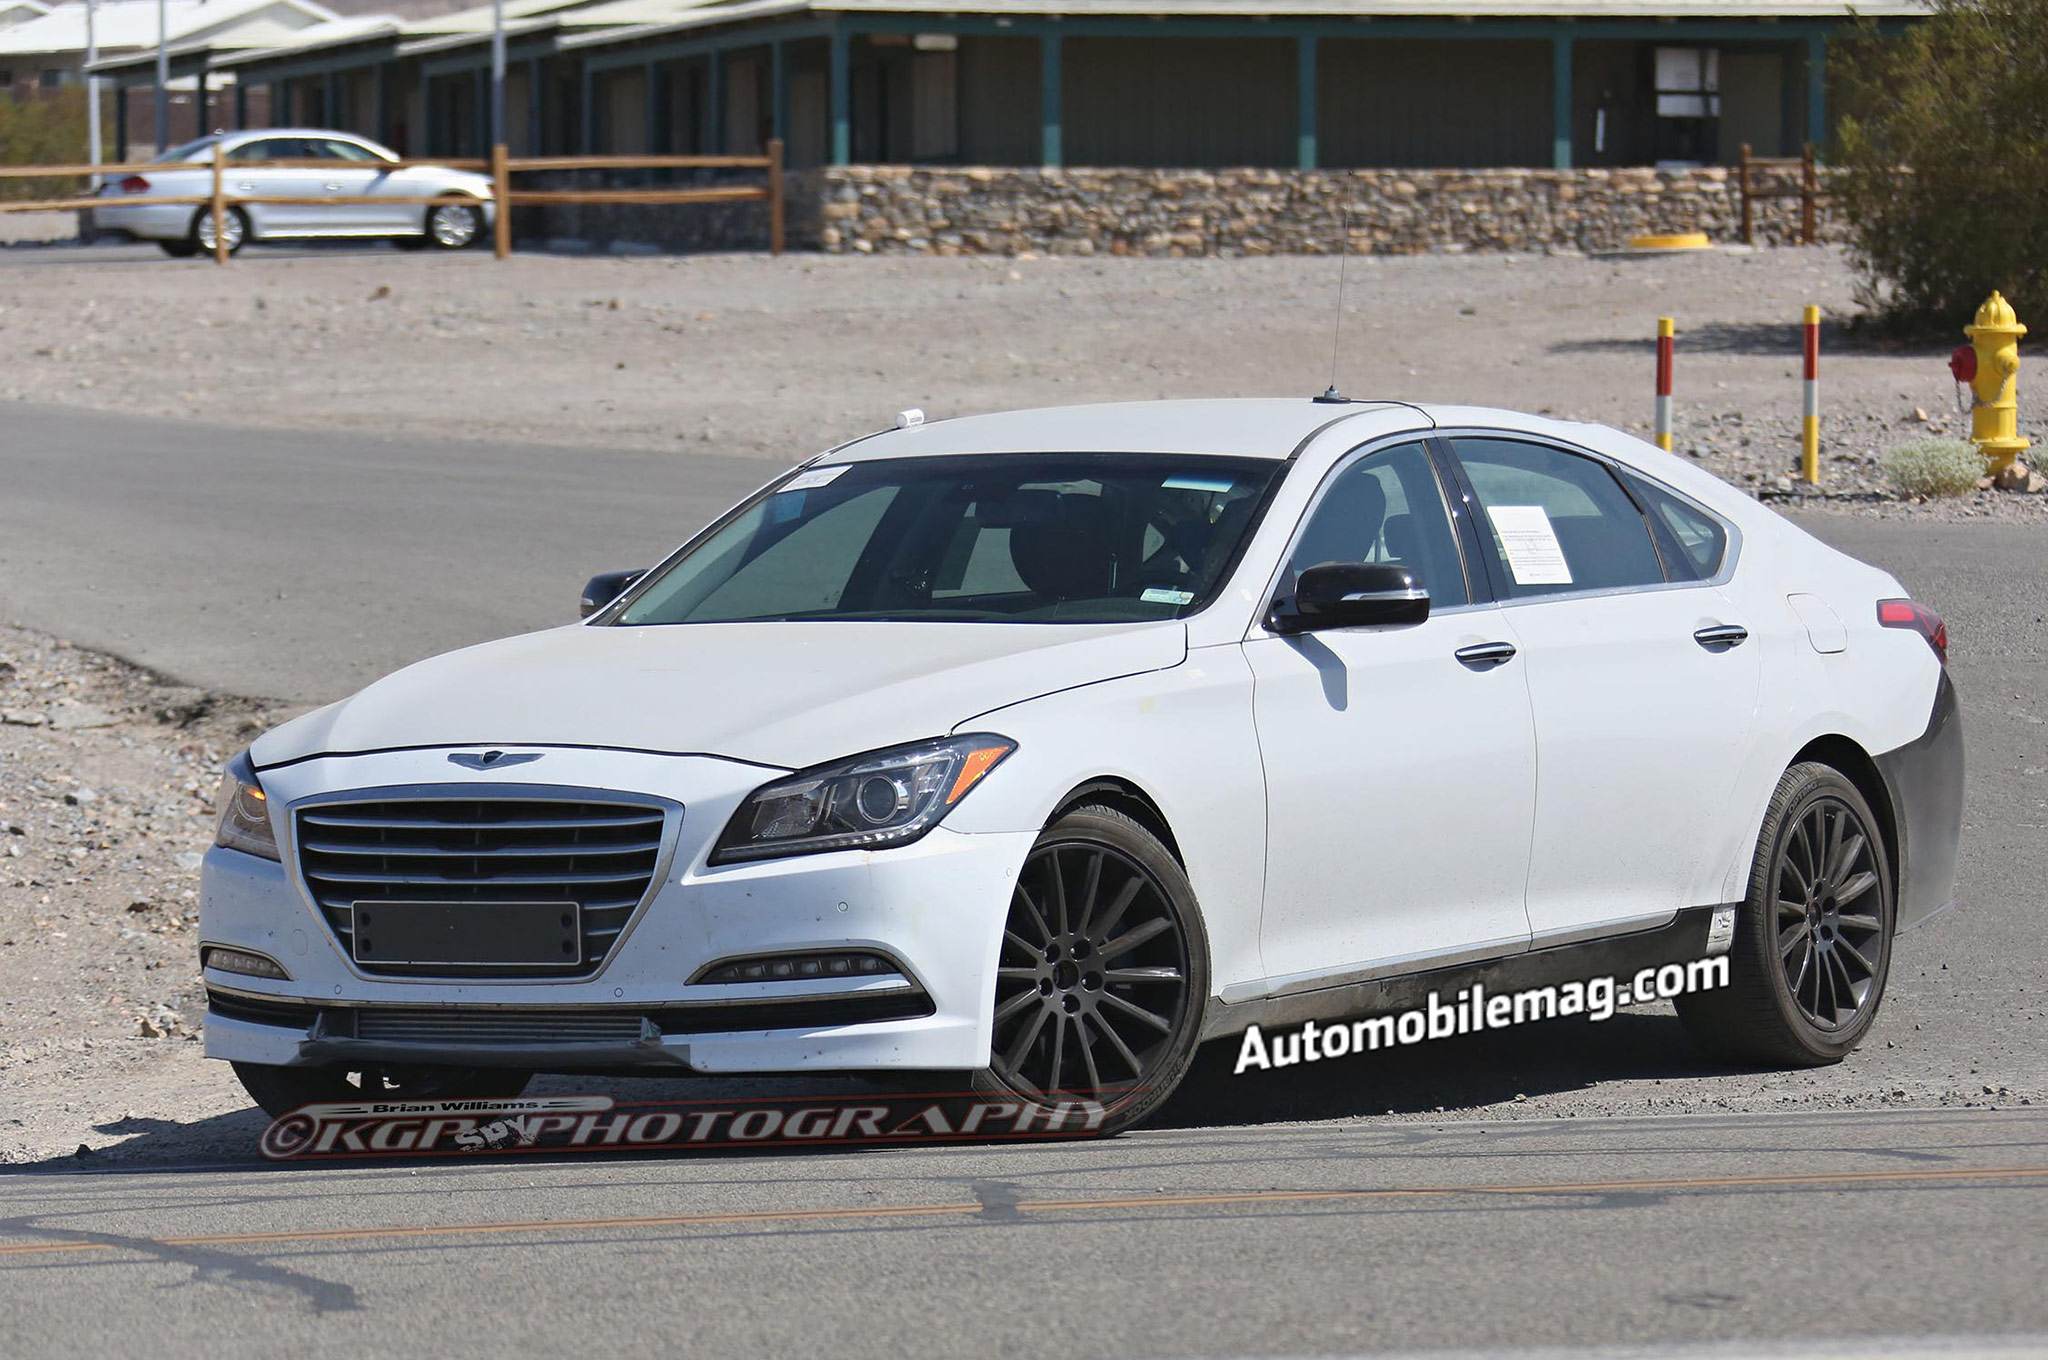 Hyundai Equus prototype spy photos front three quarter 2